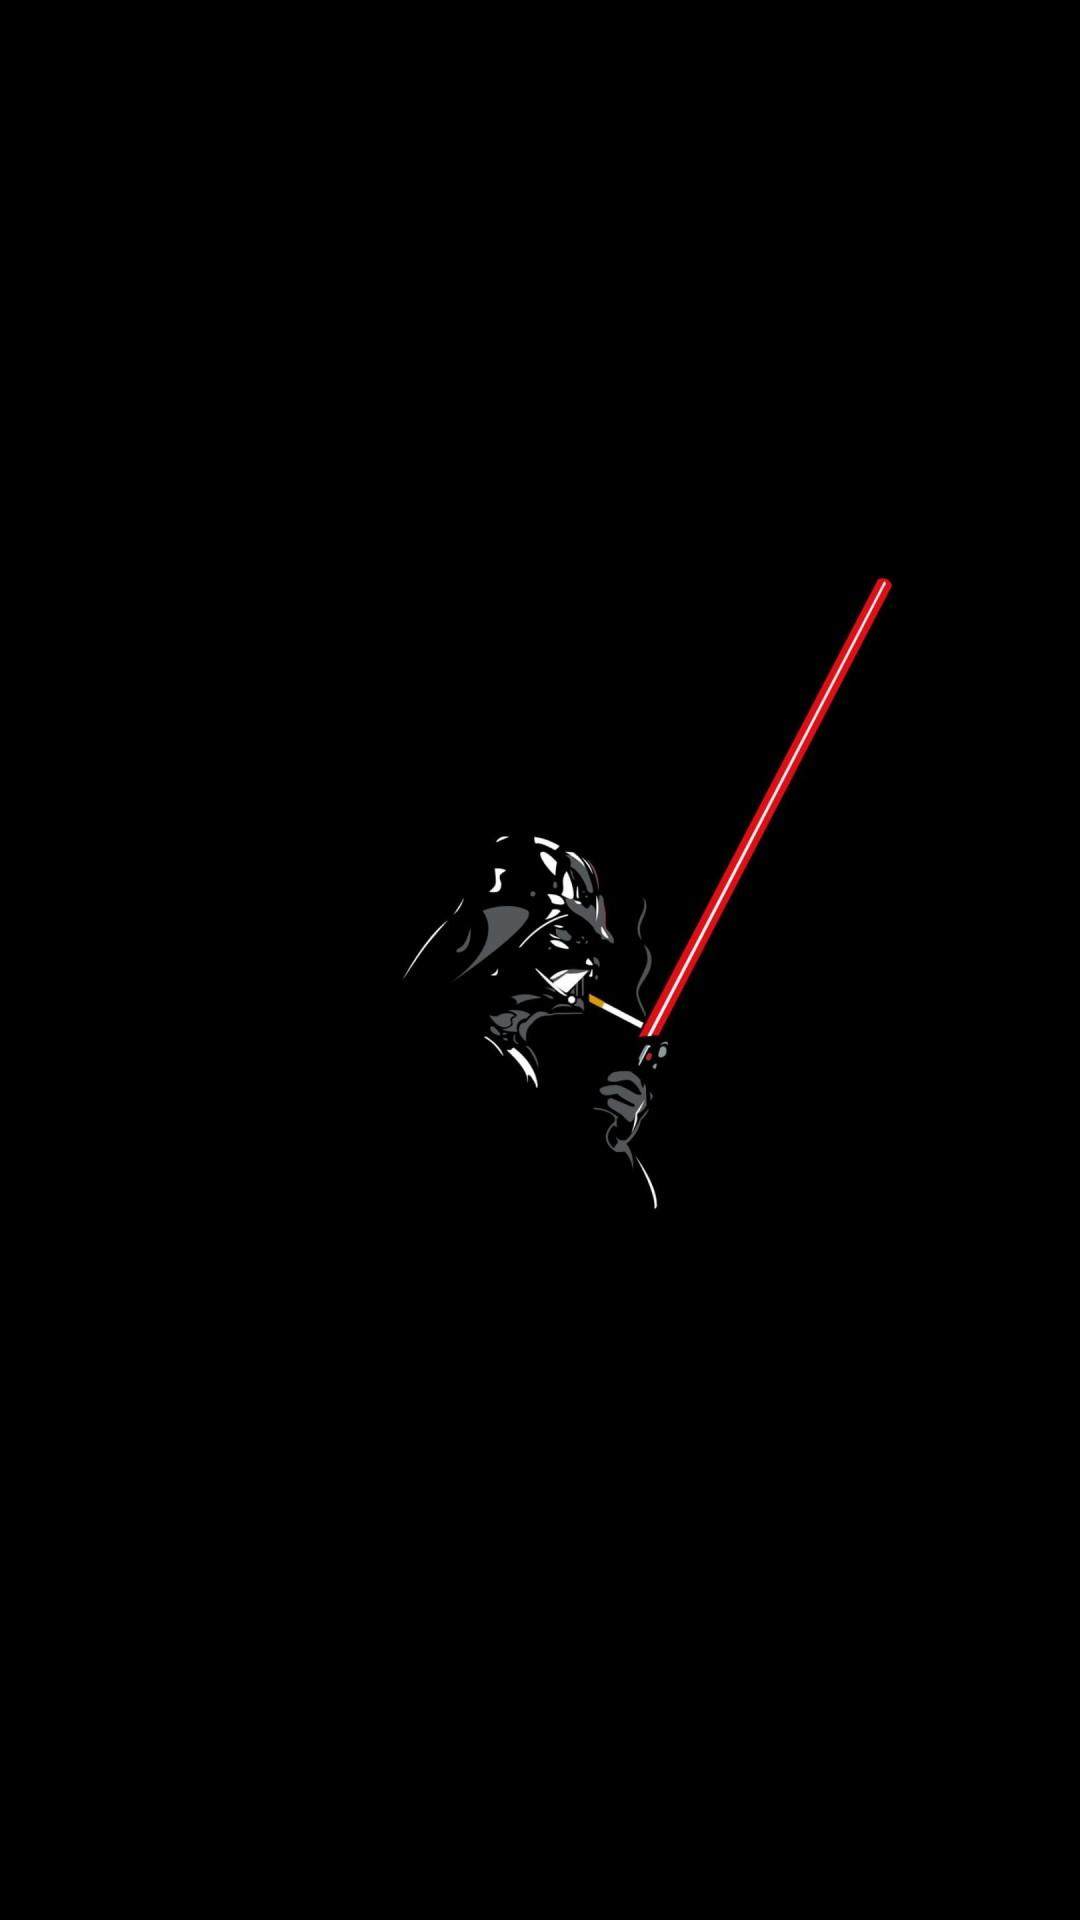 Darth Vader Lighting Cigarette